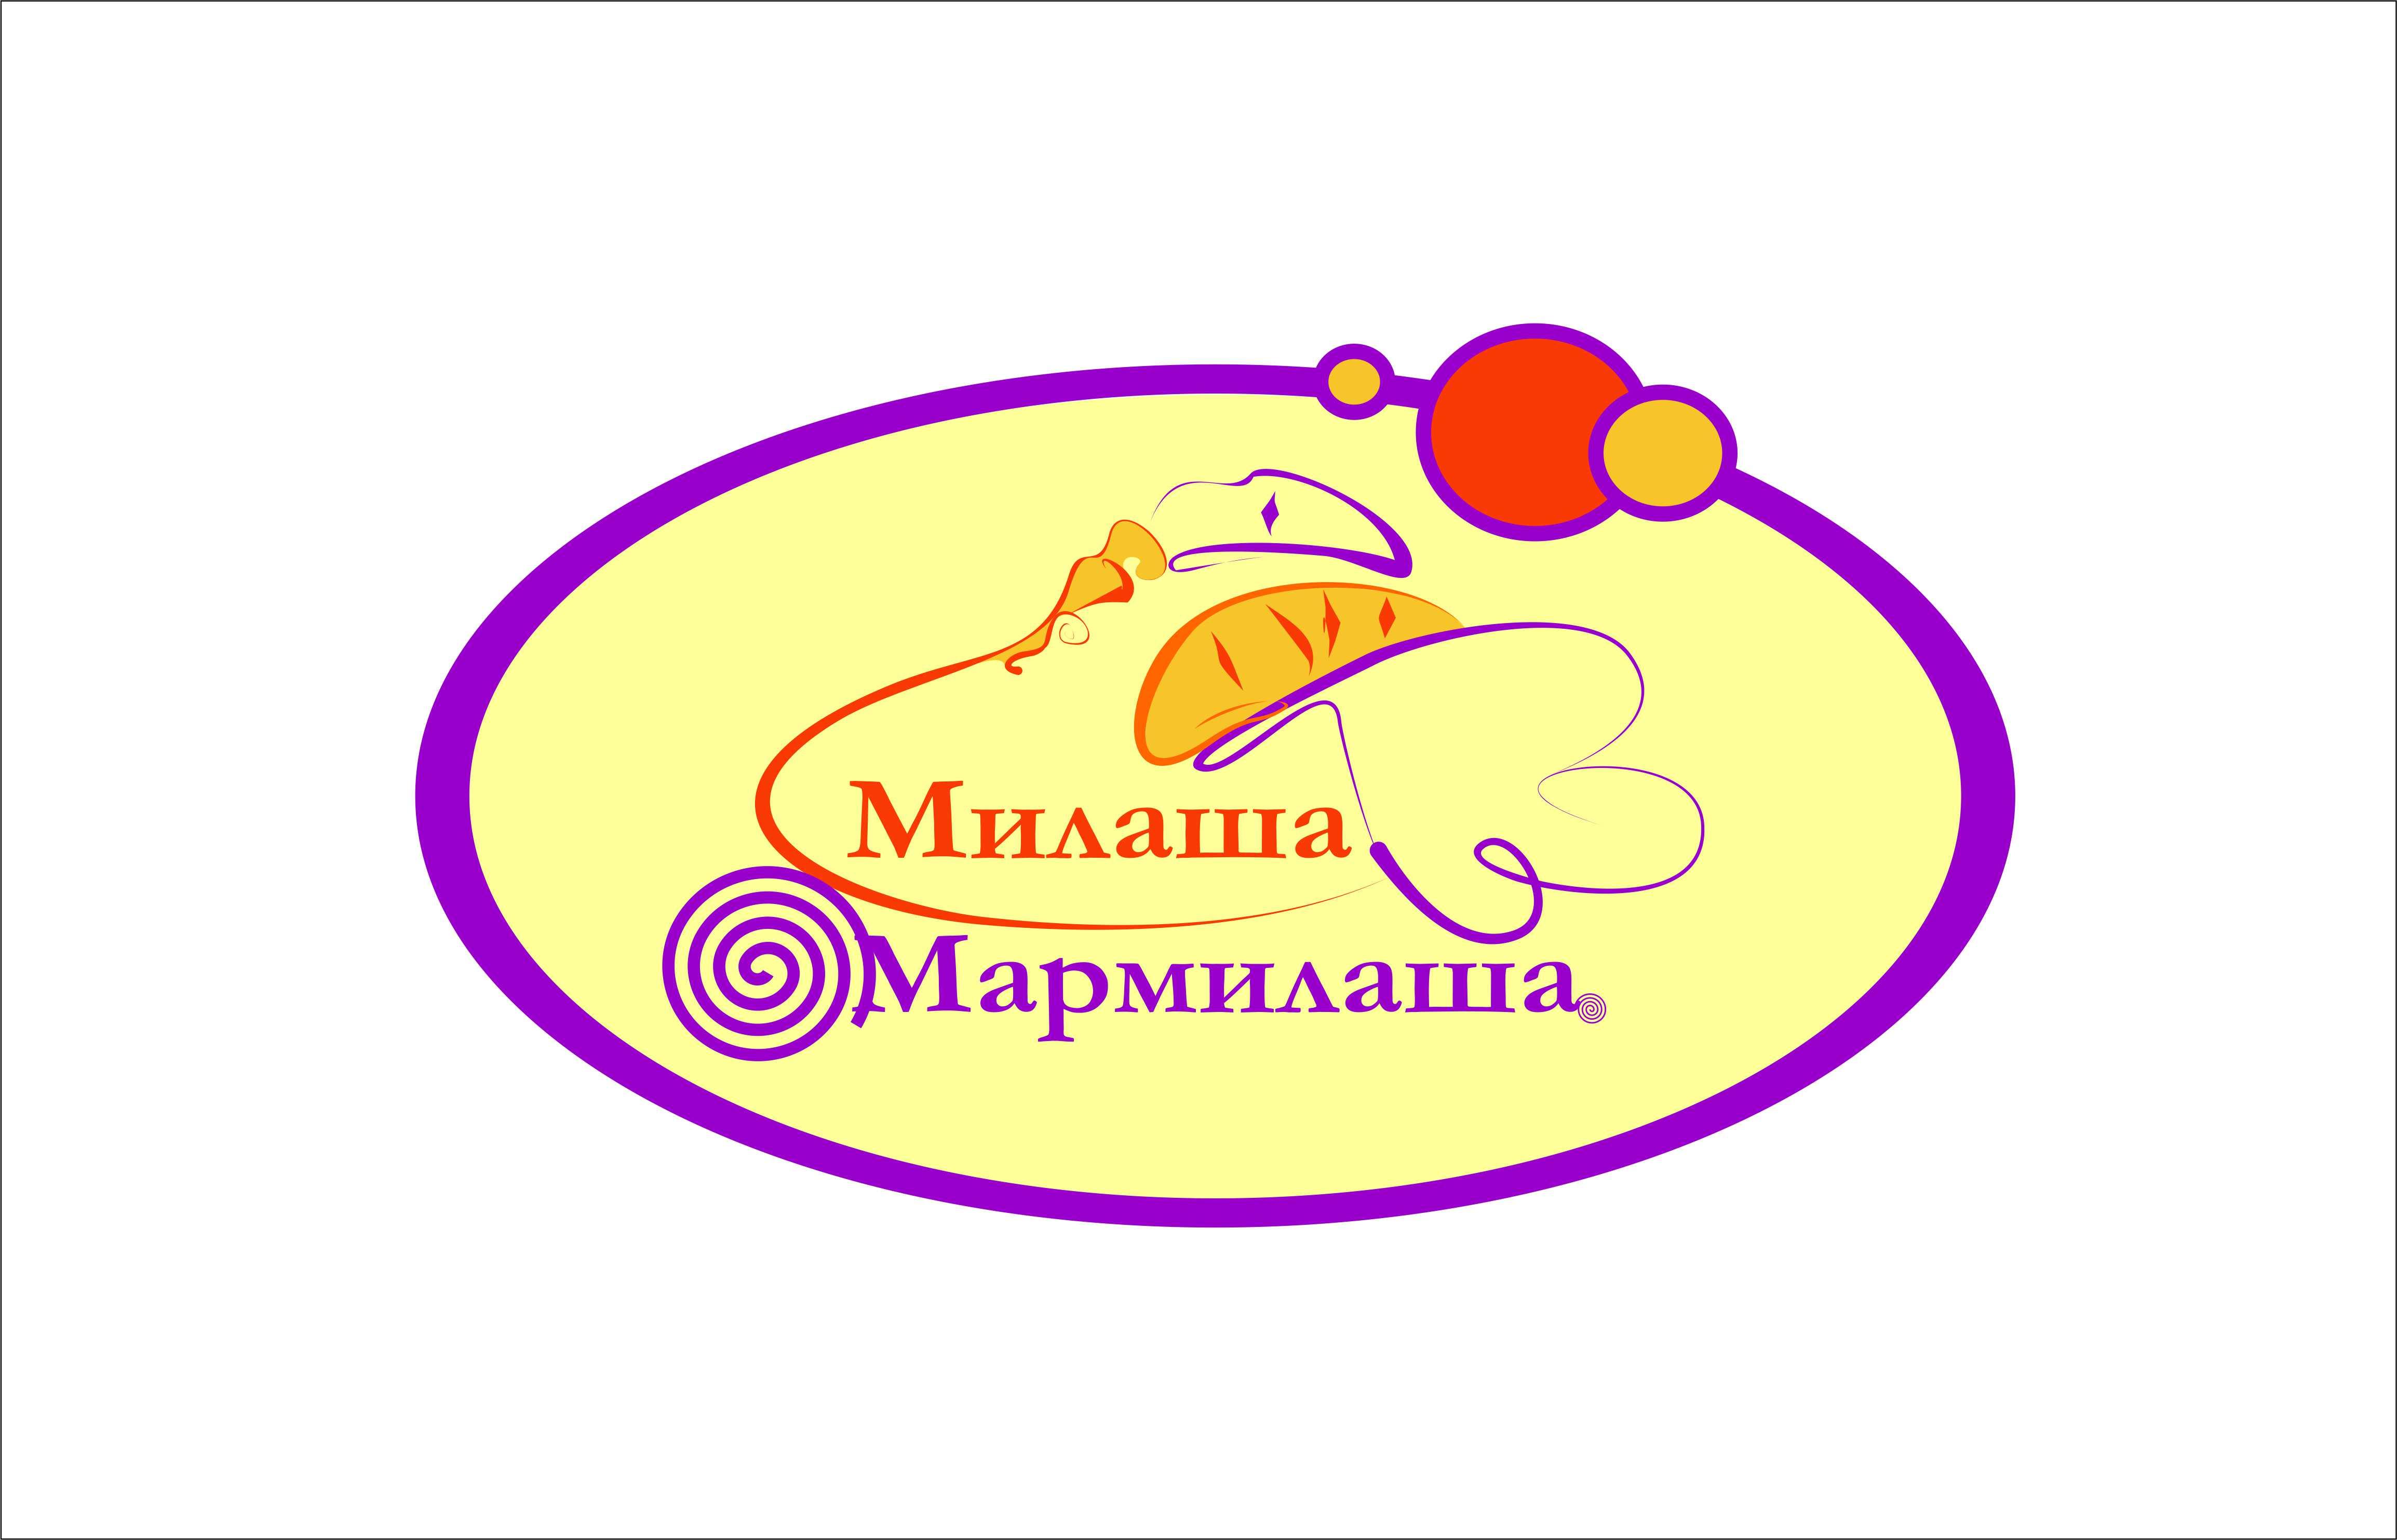 "Логотип для товарного знака ""Милаша-Мармилаша"" фото f_732587e6a03ae2e9.jpg"